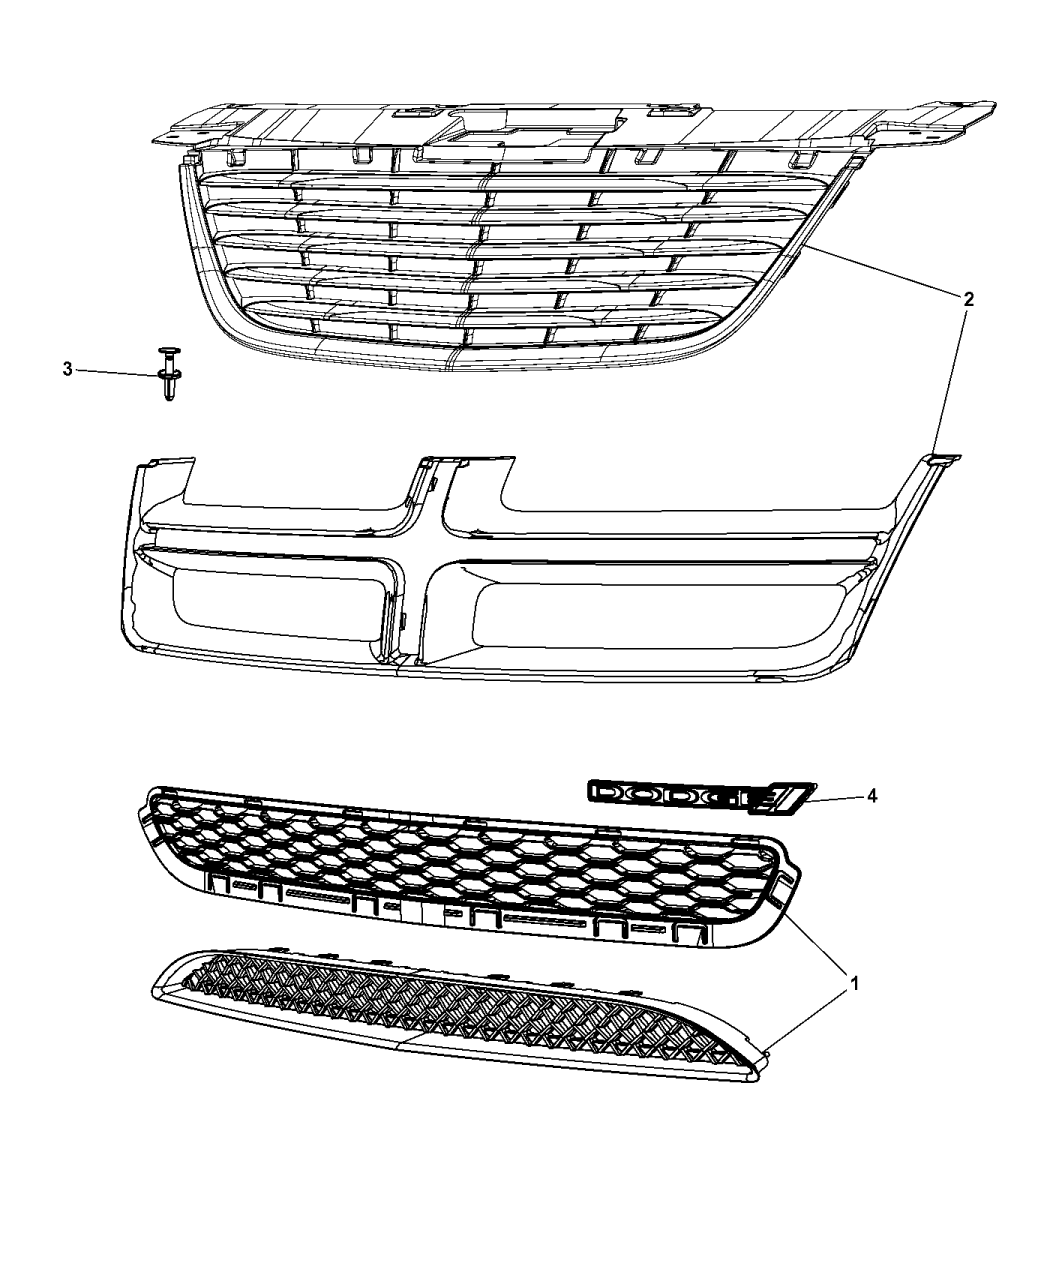 2013 Chrysler 200 Grille